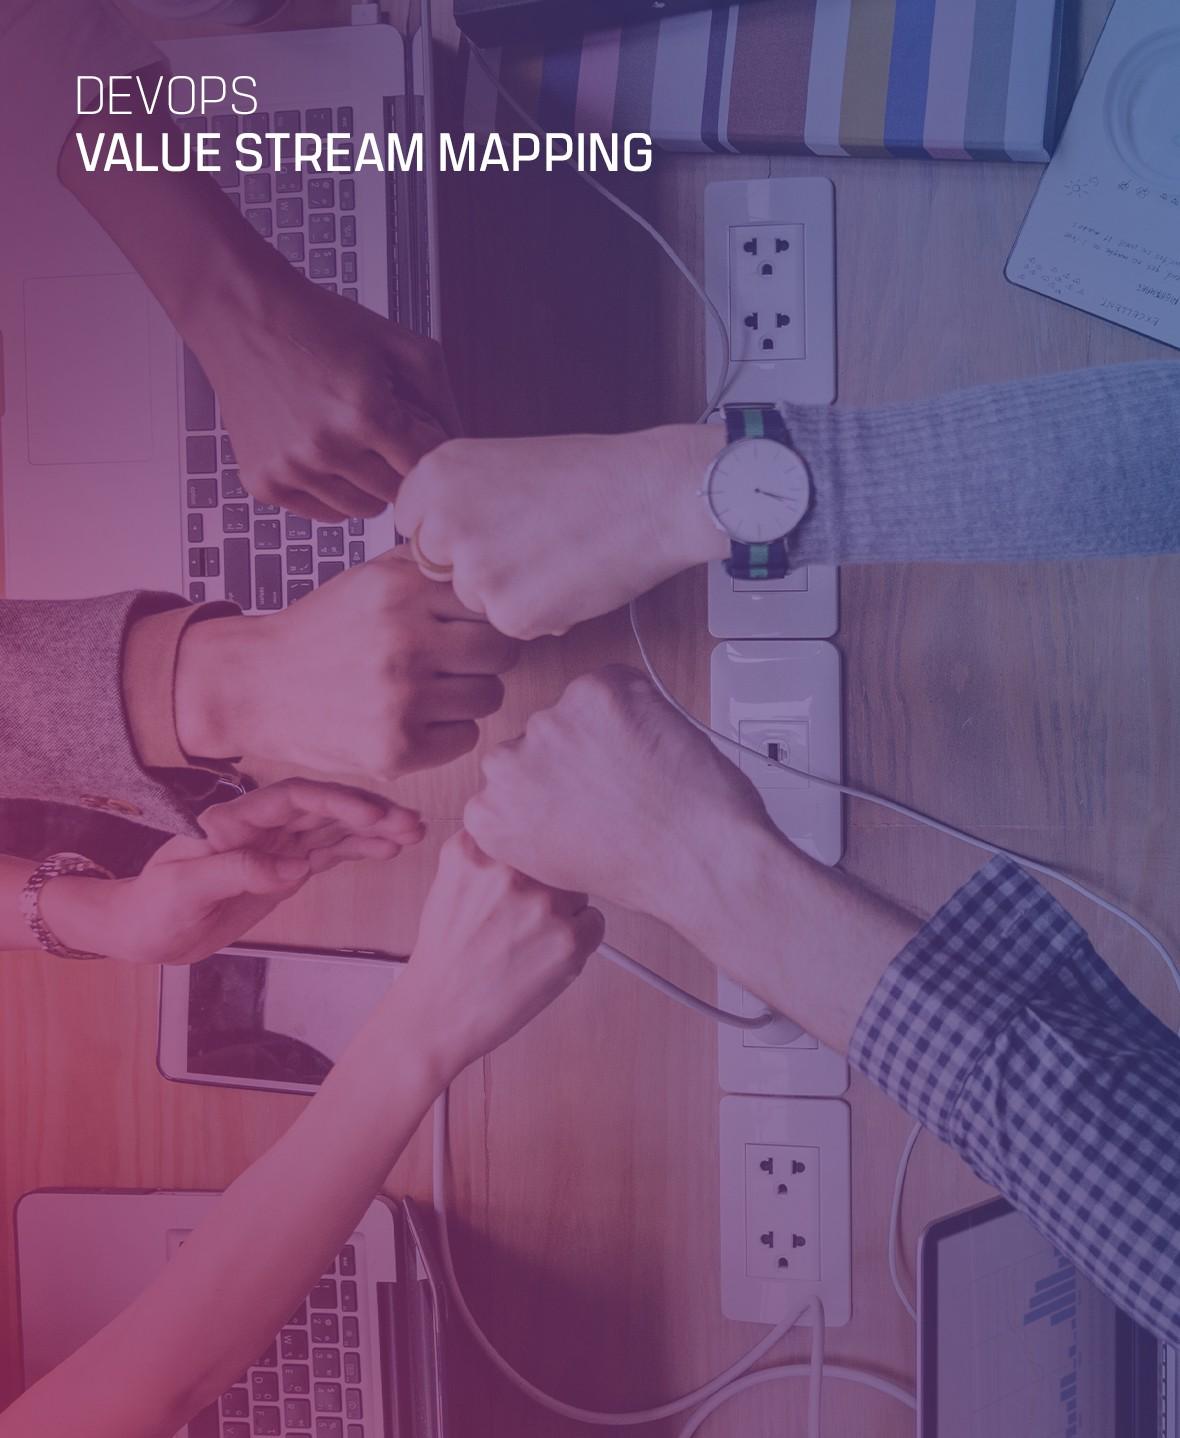 DevOps Deepdive—Value Stream Mapping